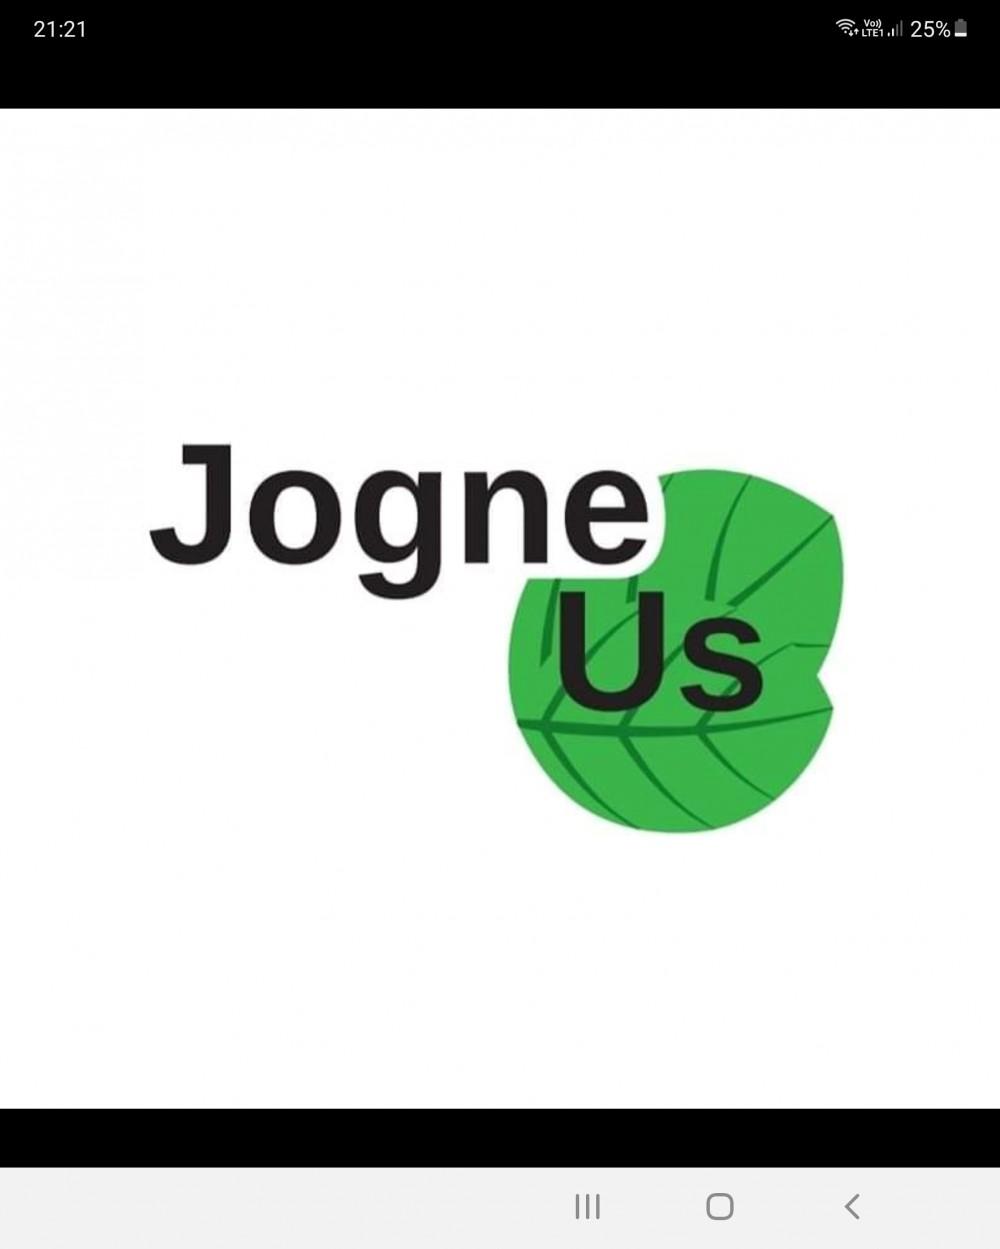 JogneUs